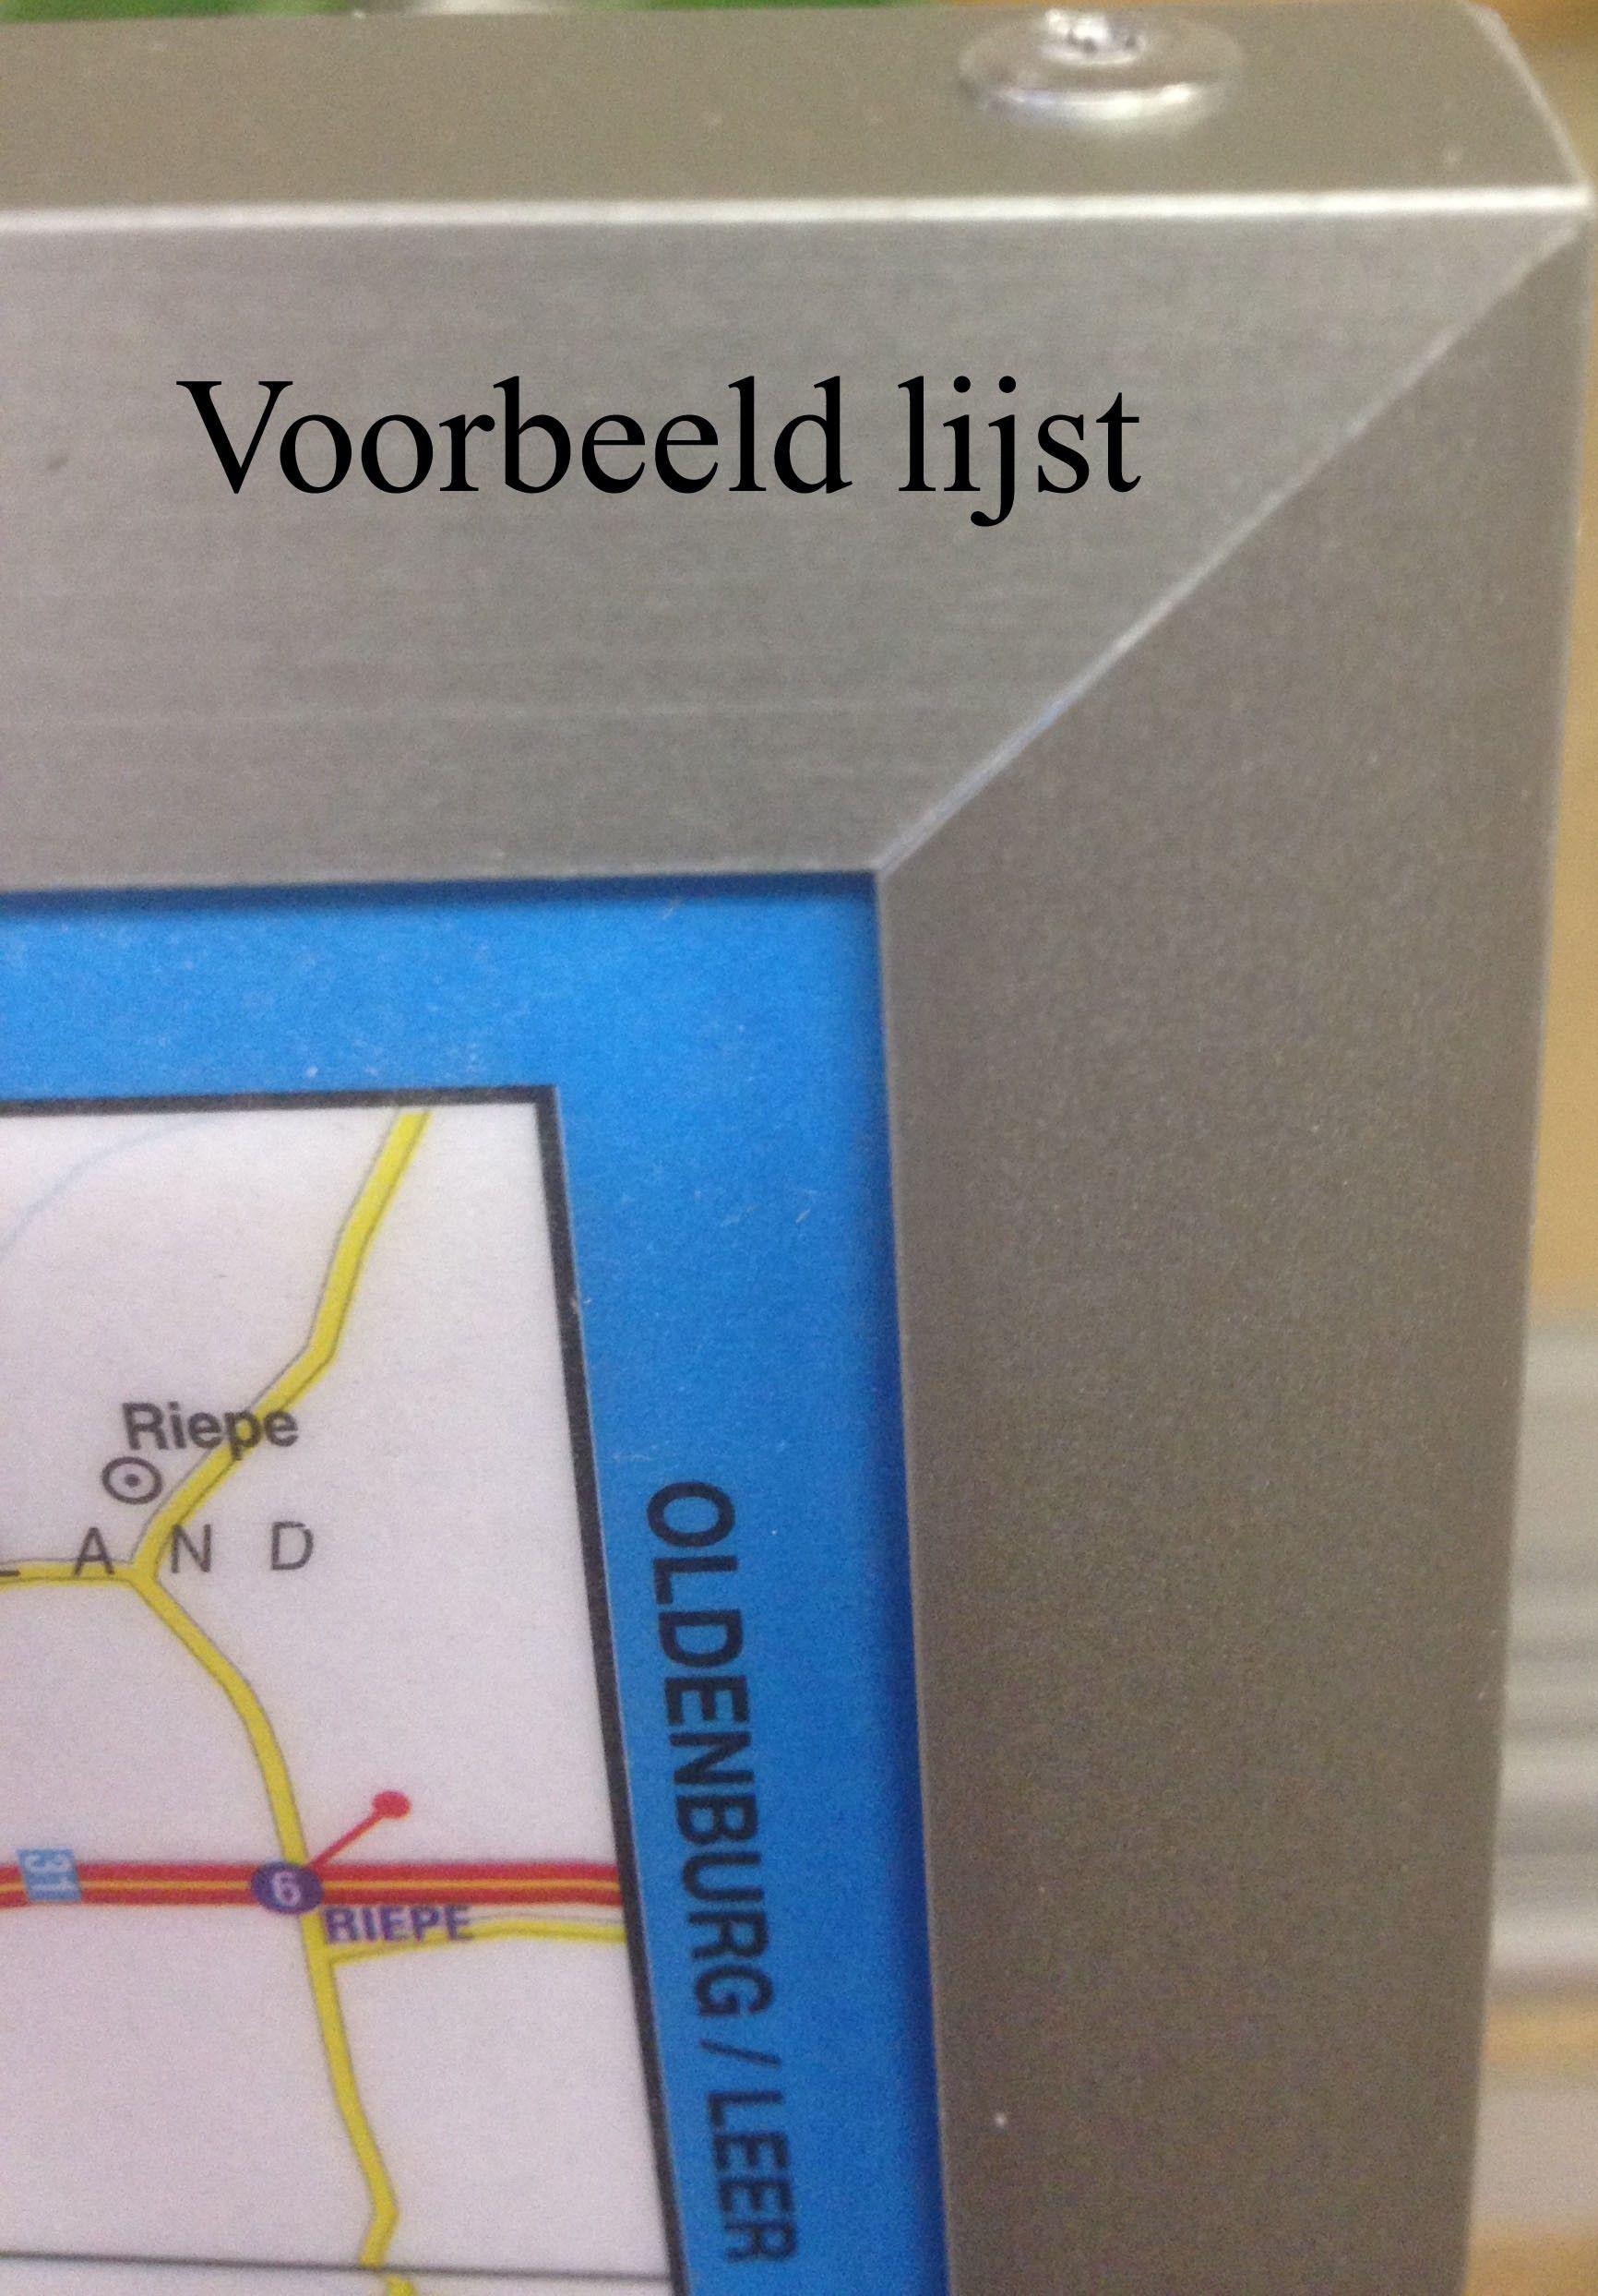 Landkaart Gos-Landen